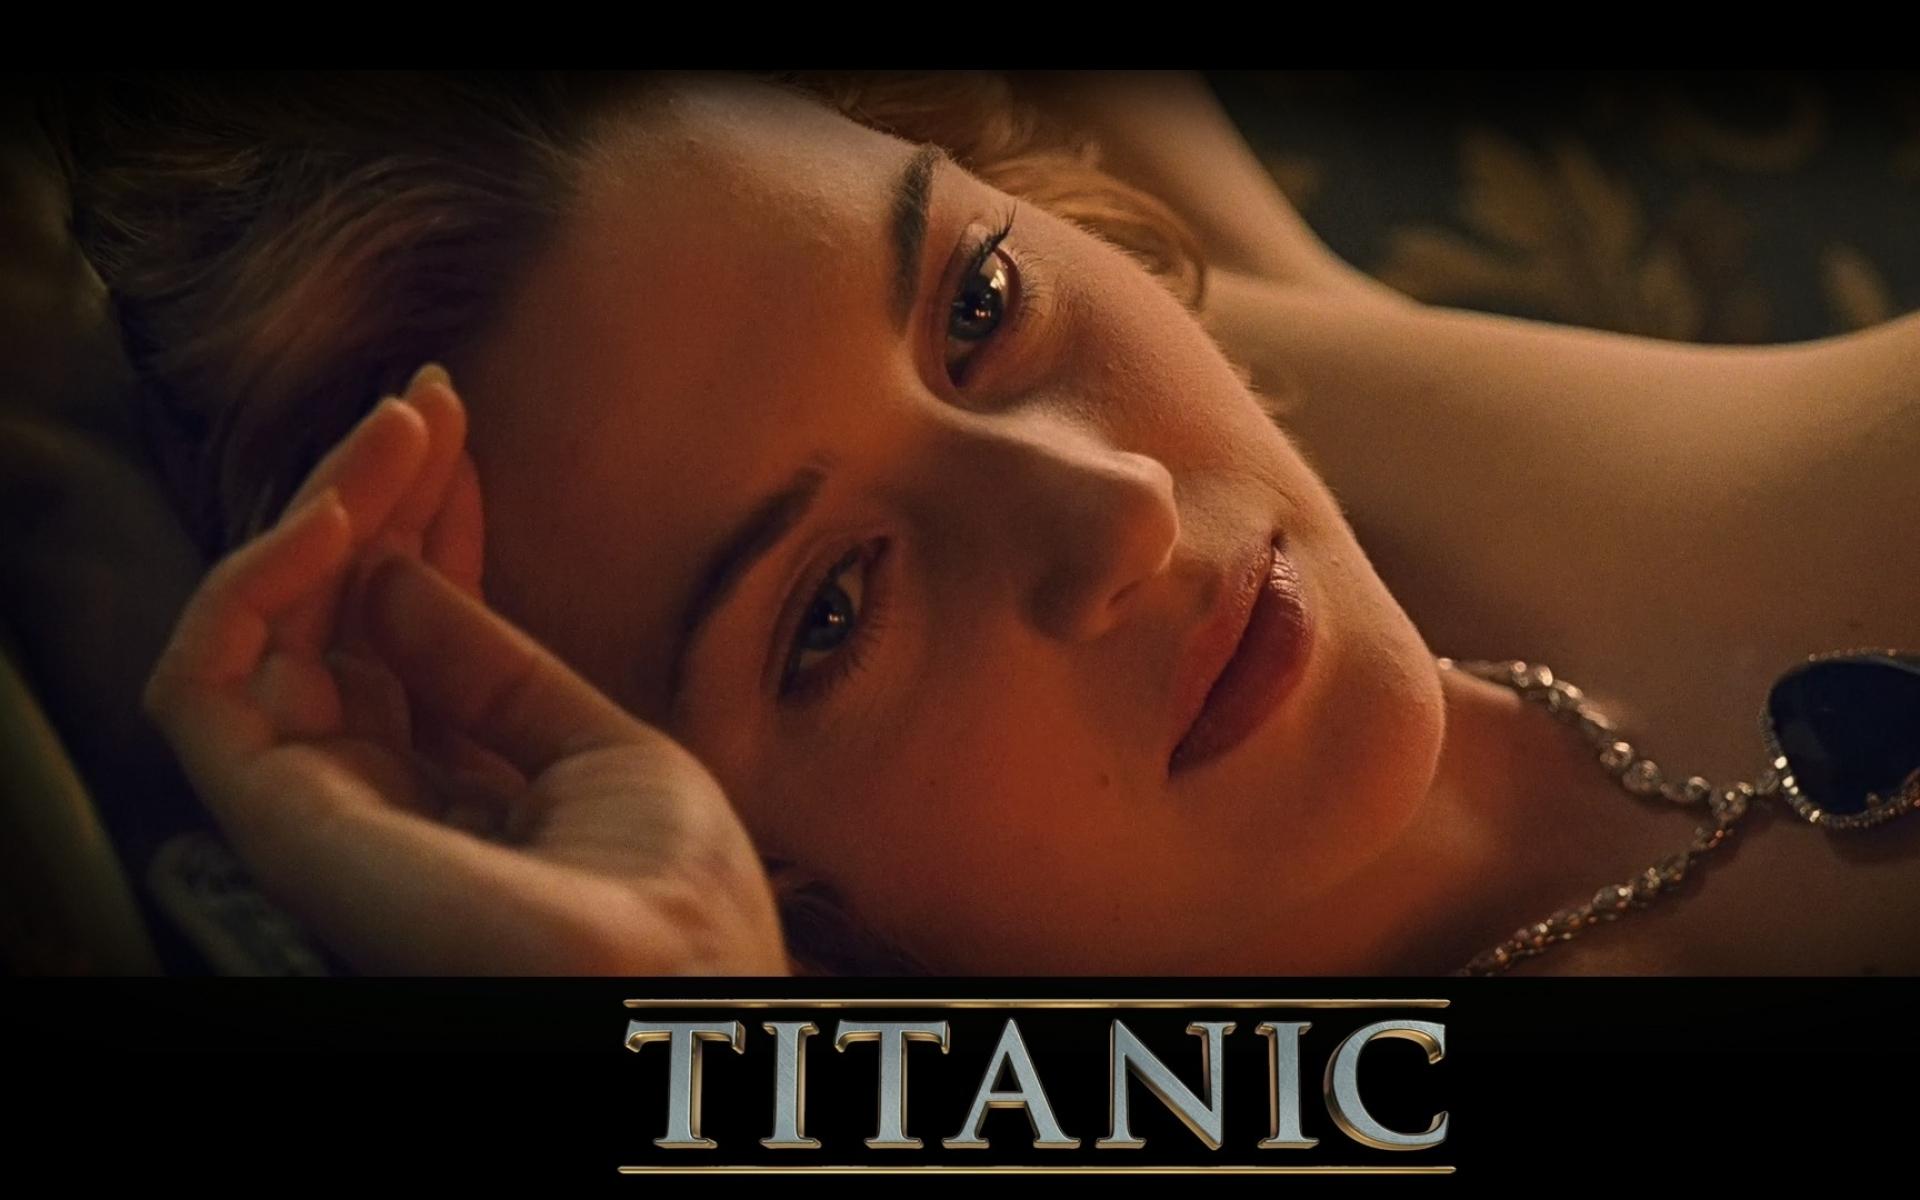 Titanic full movie in naked nude, beastility porn tube